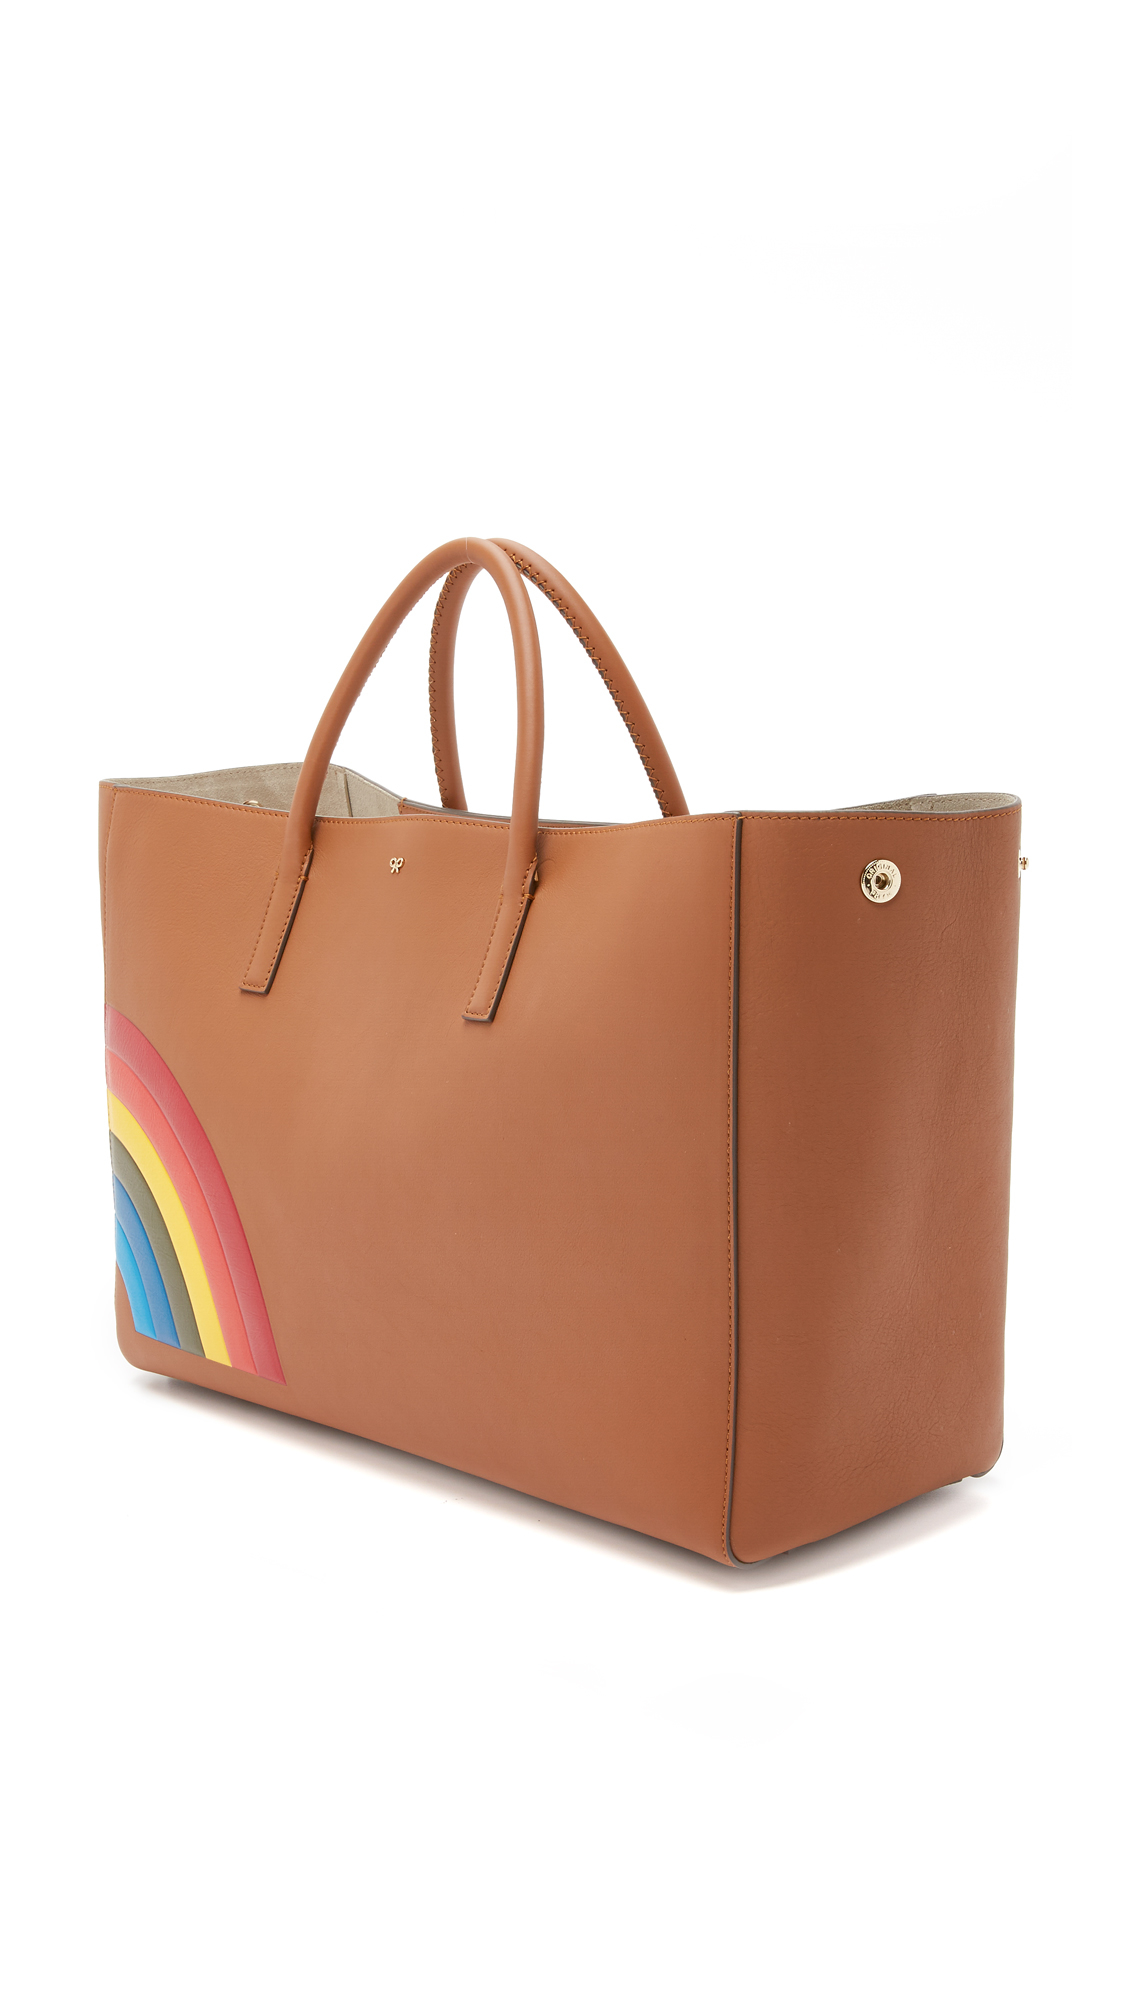 Anya hindmarch Rainbow Ebury Maxi Tote in Brown